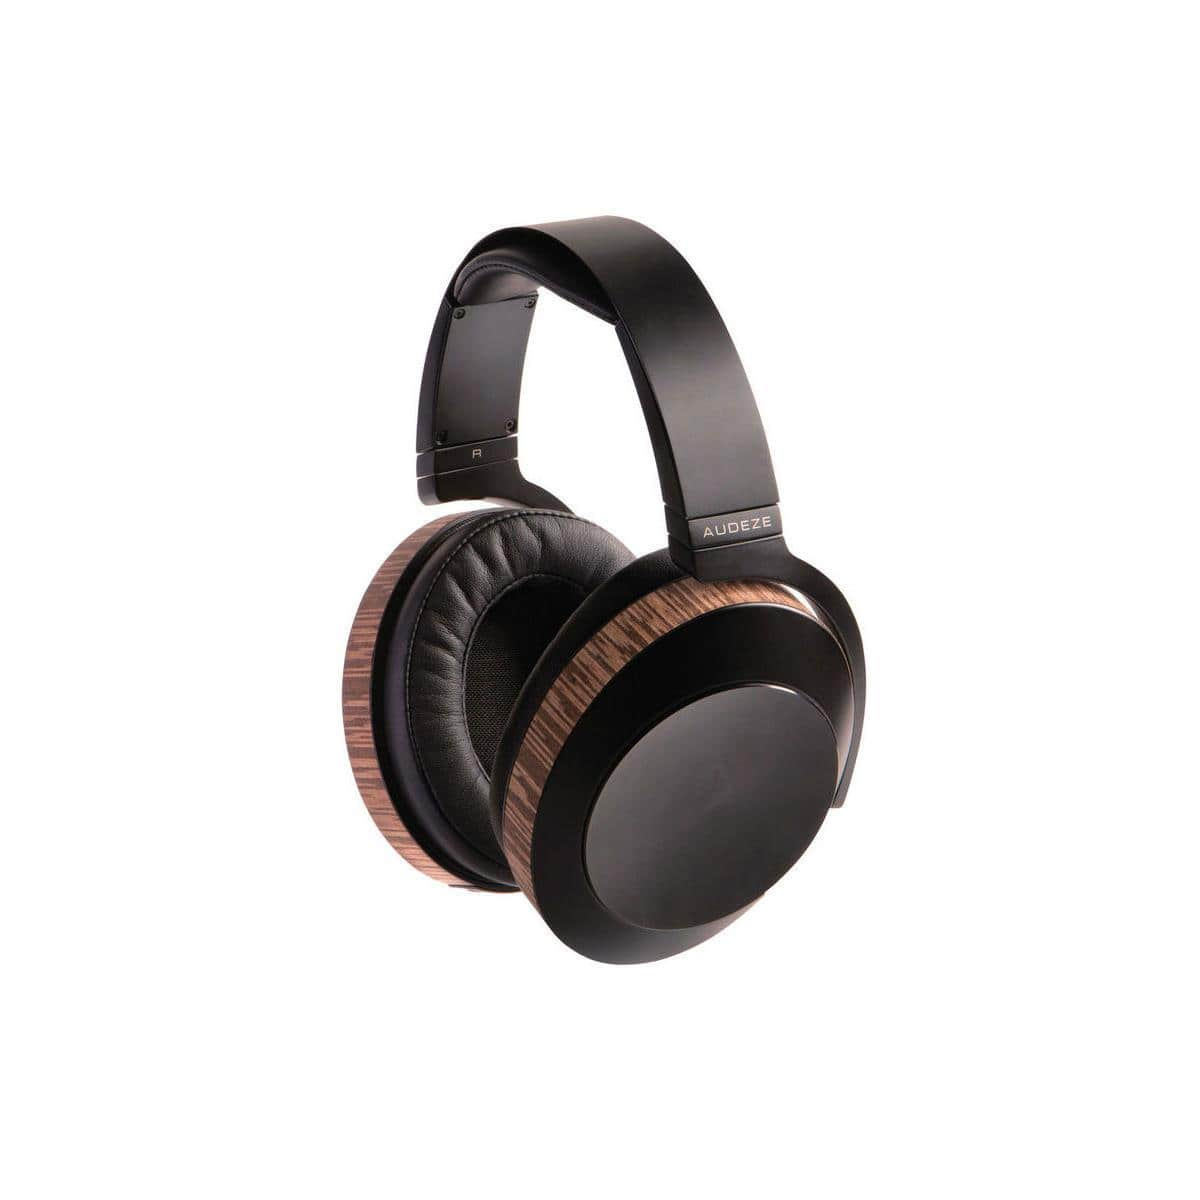 Audeze EL-8 Closed or Open Planar Magnetic Headphones  $450 + Free Shipping